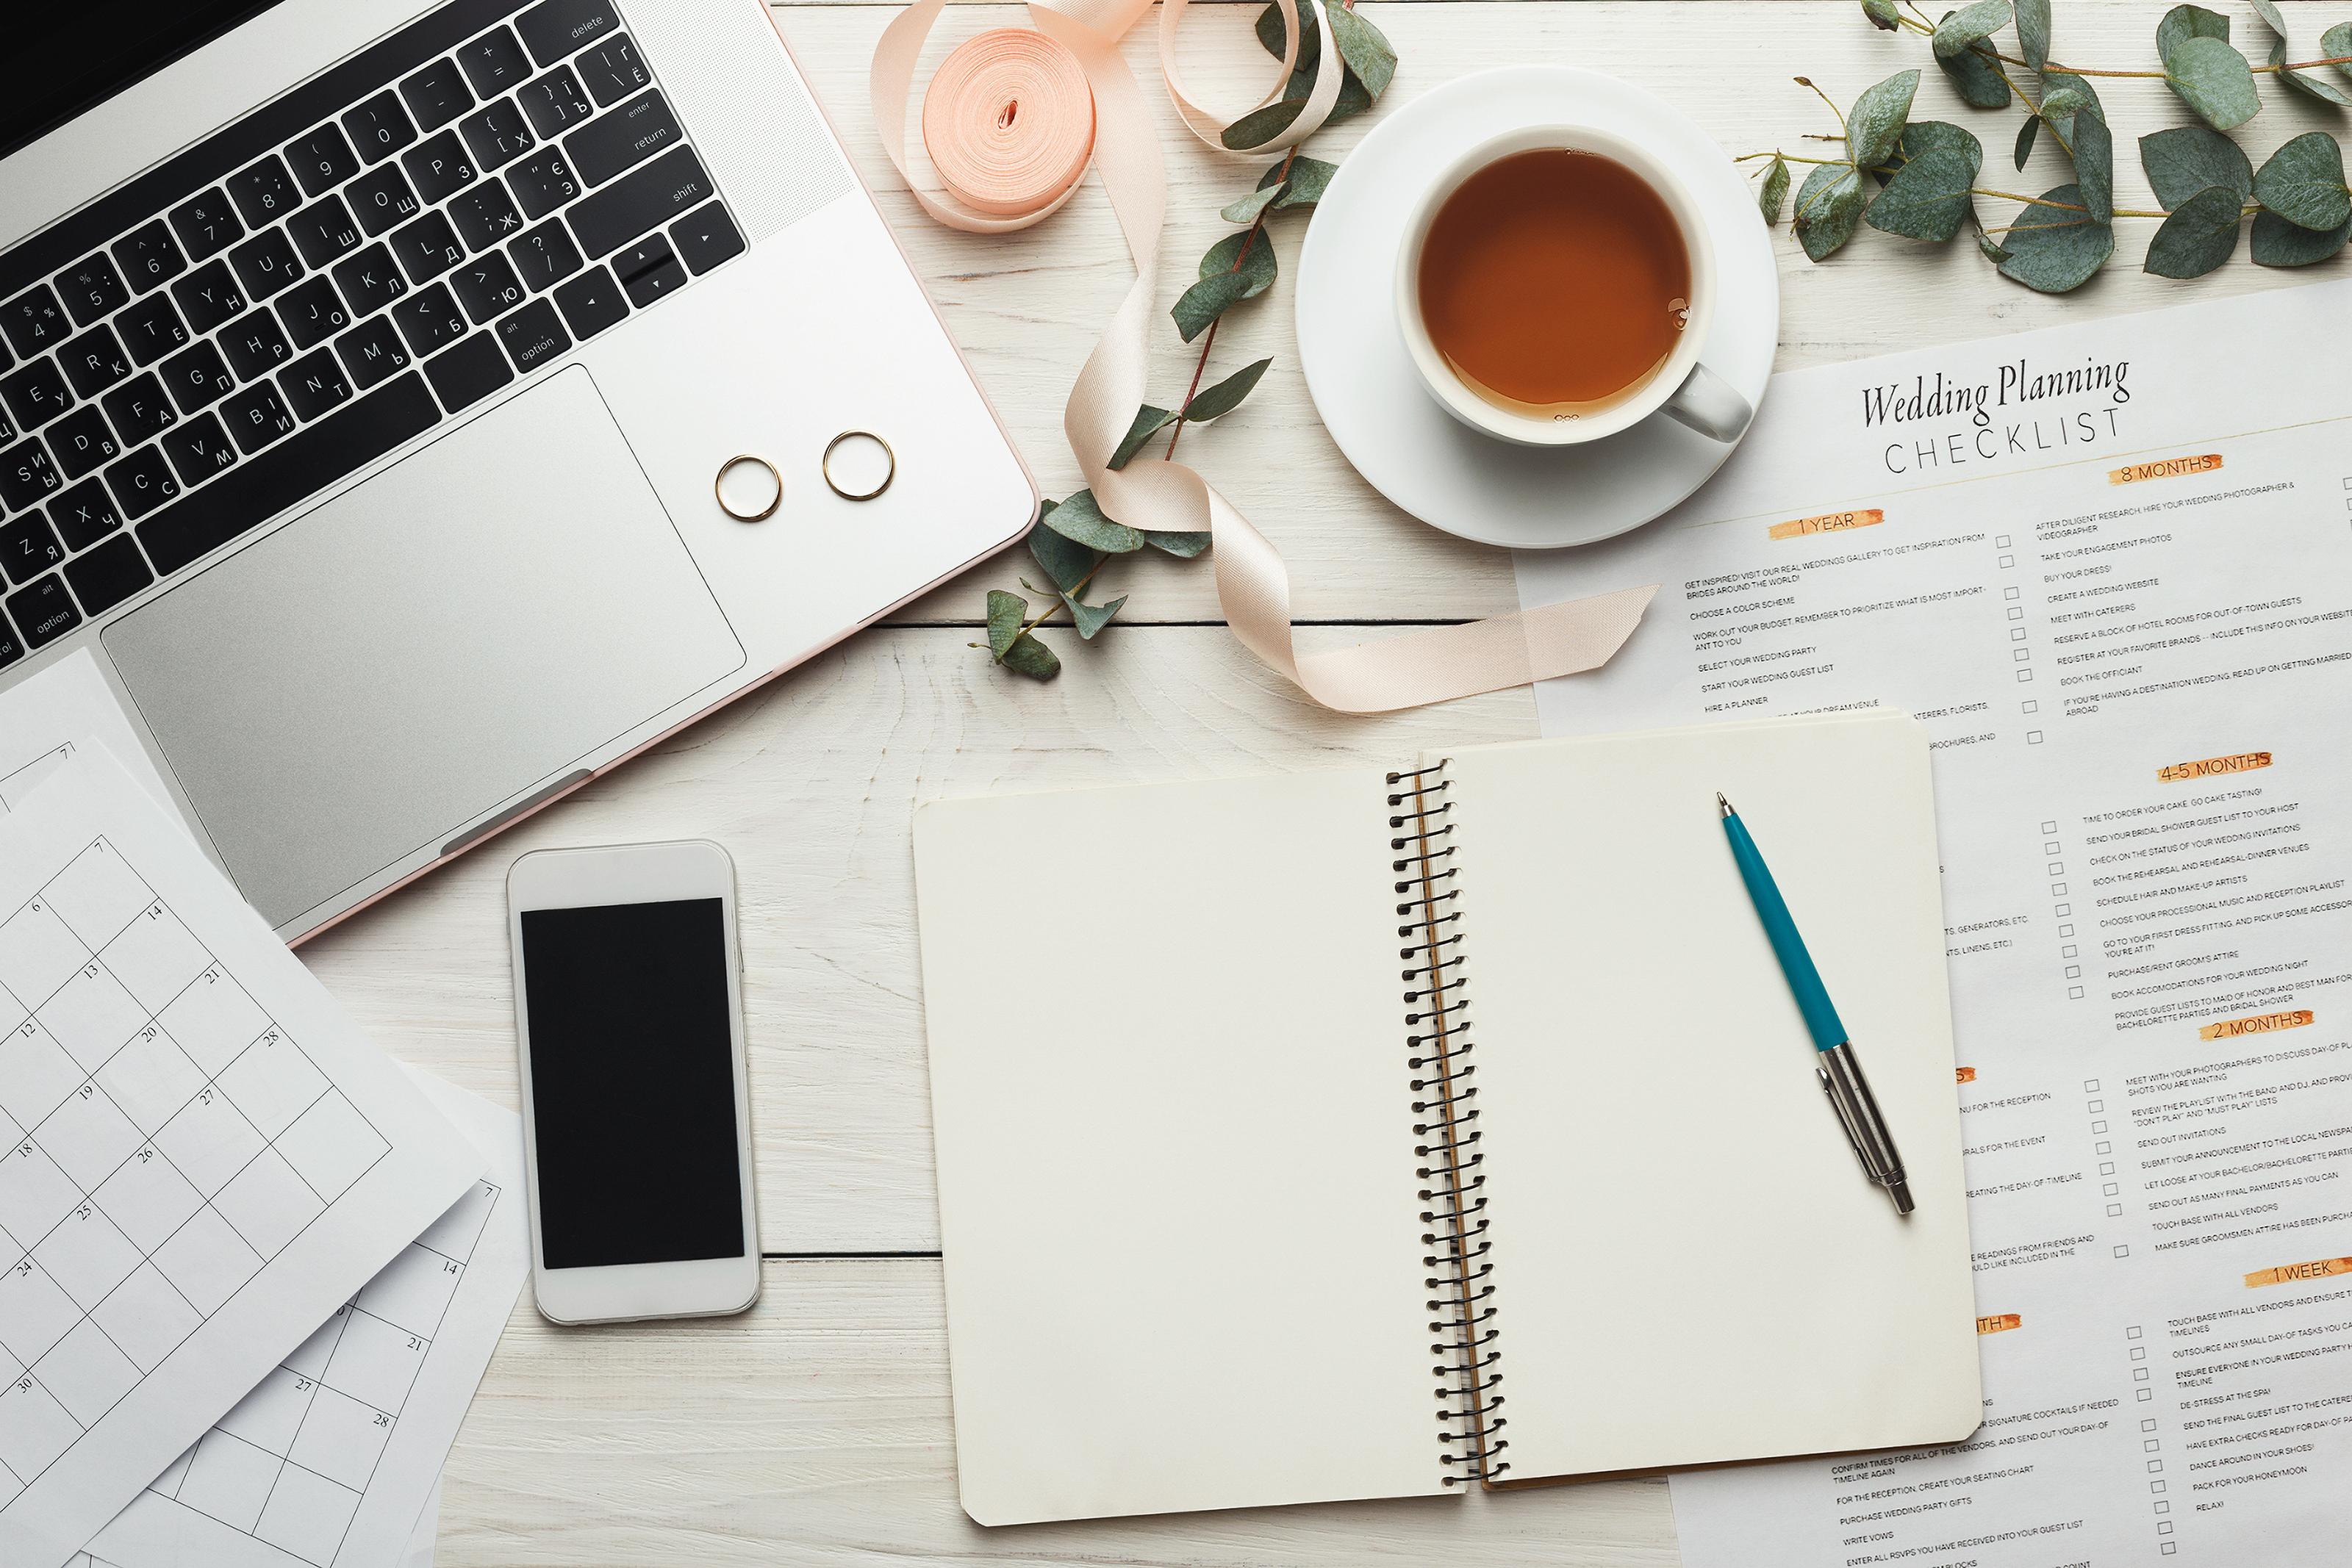 Wedding Planning Checklist and Laptop